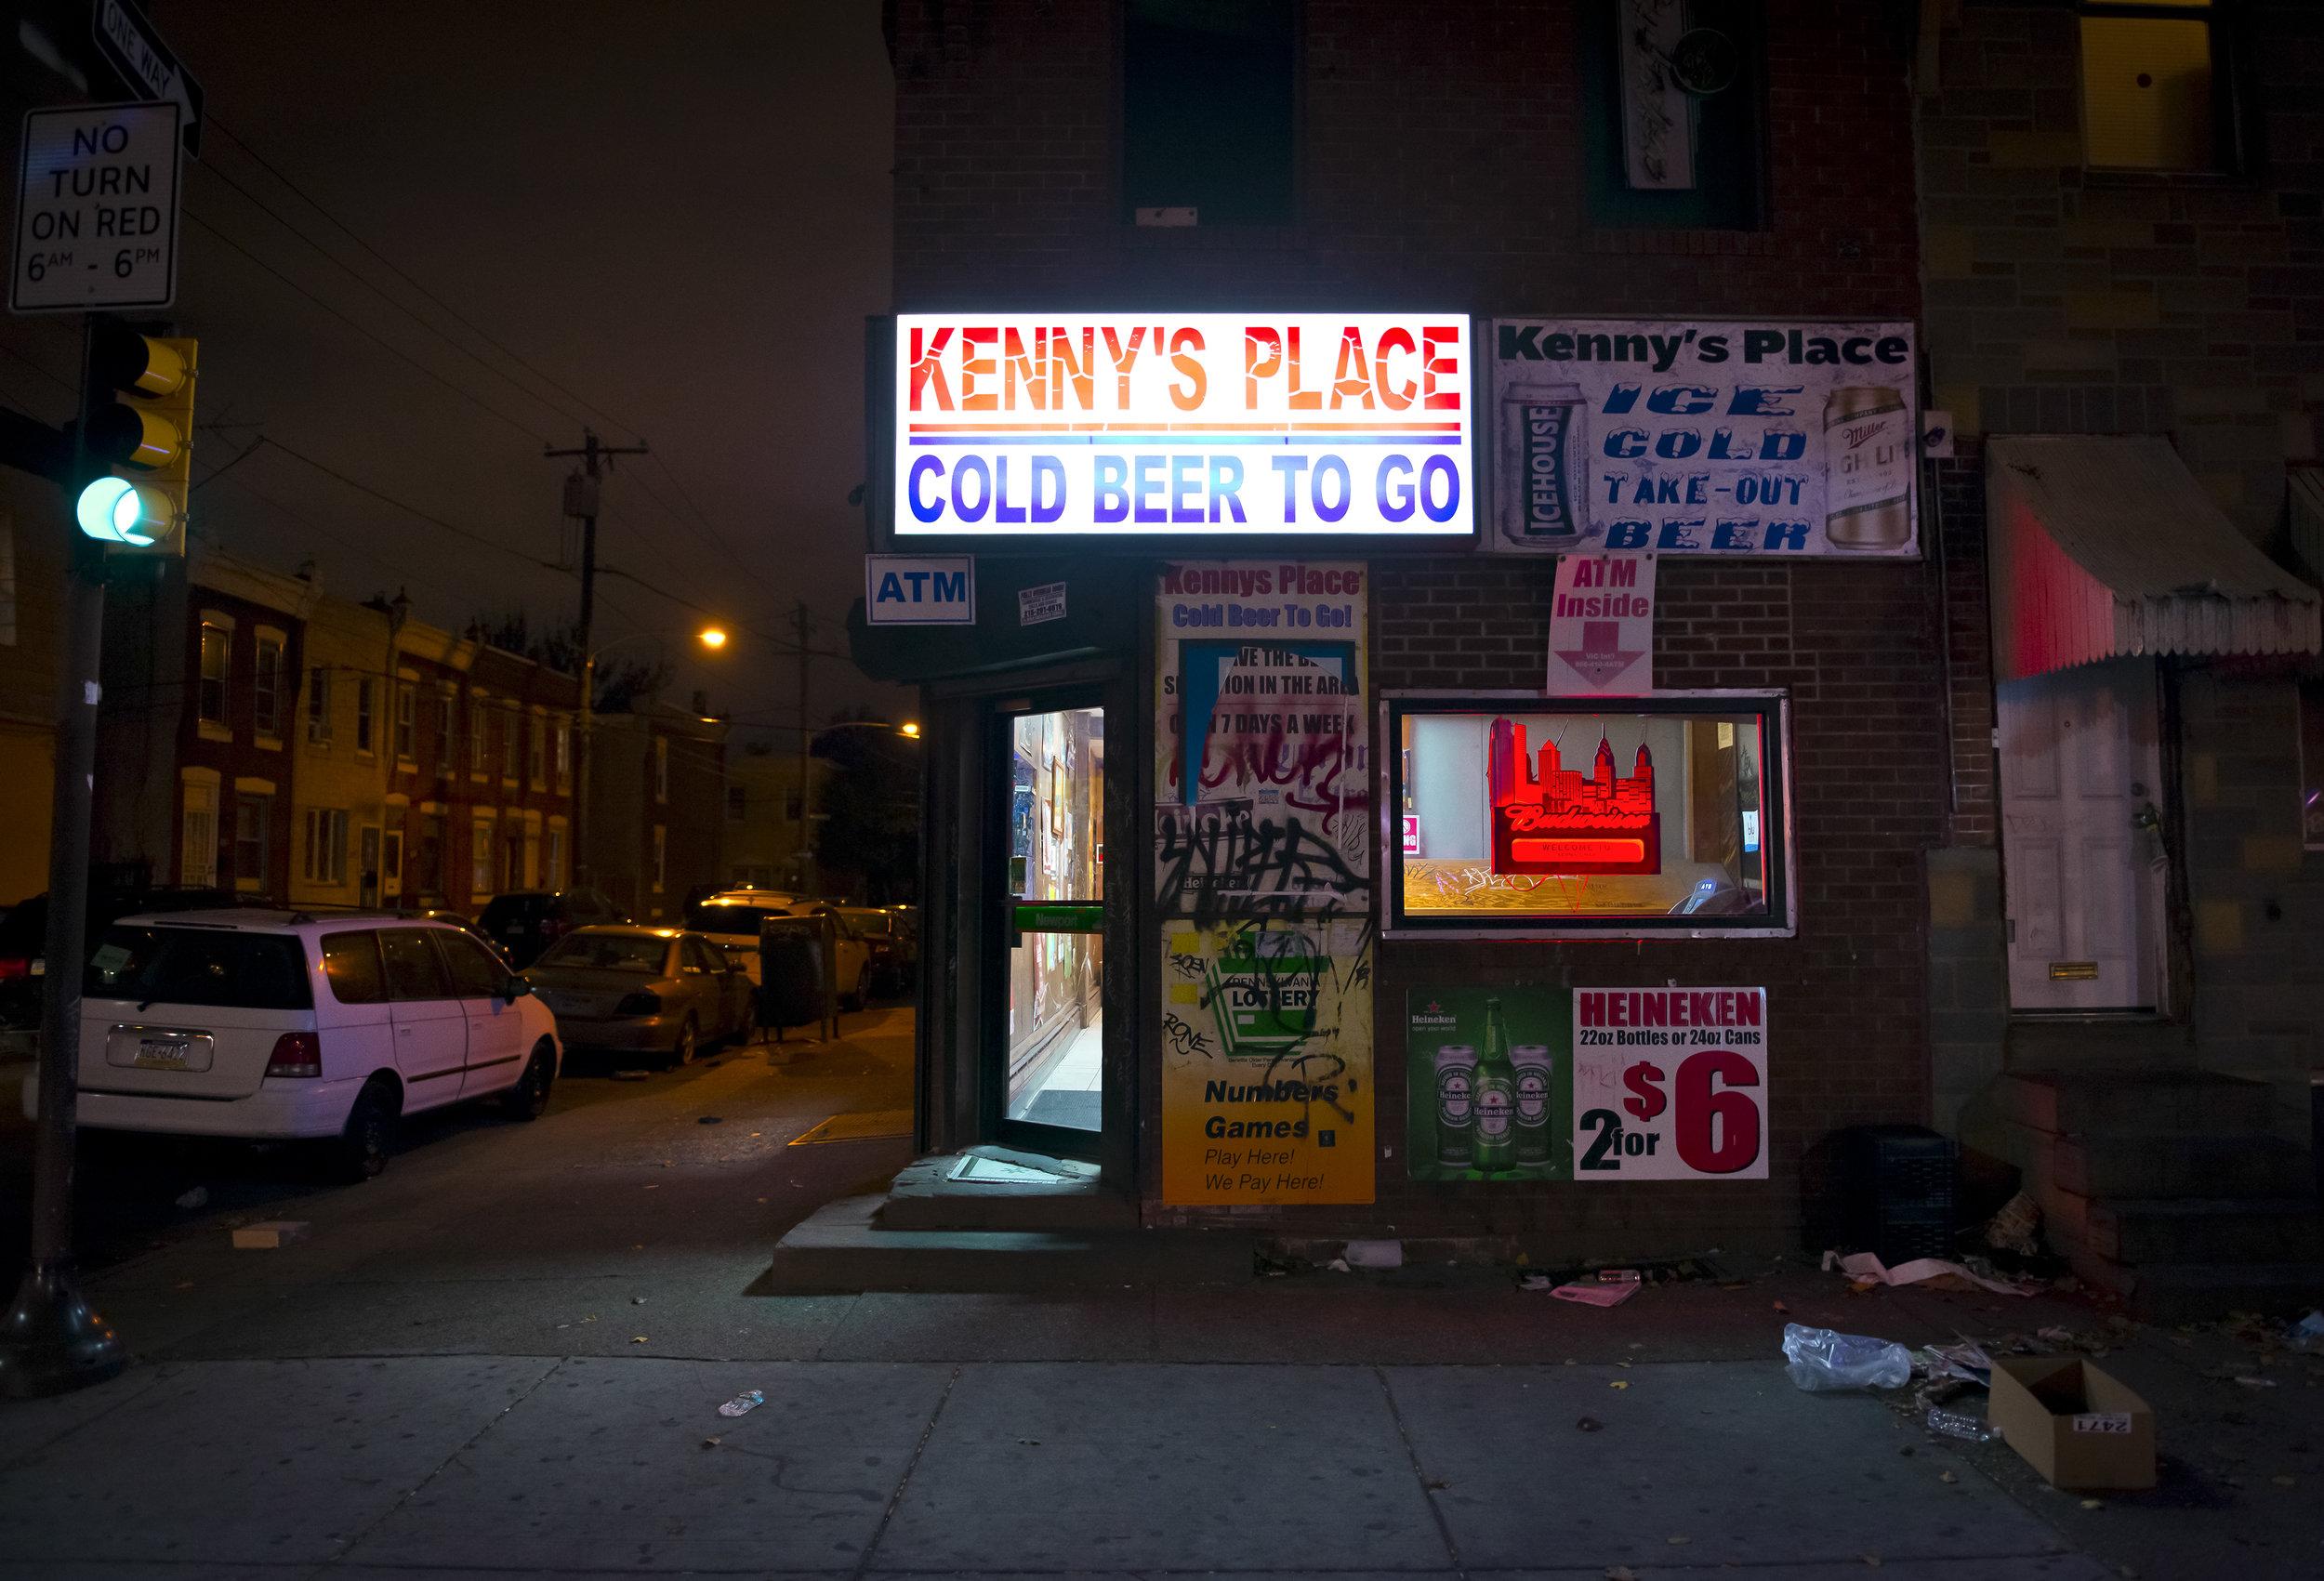 KENNY'S PLACE-KENSINGTON-112016 1111pm.jpg